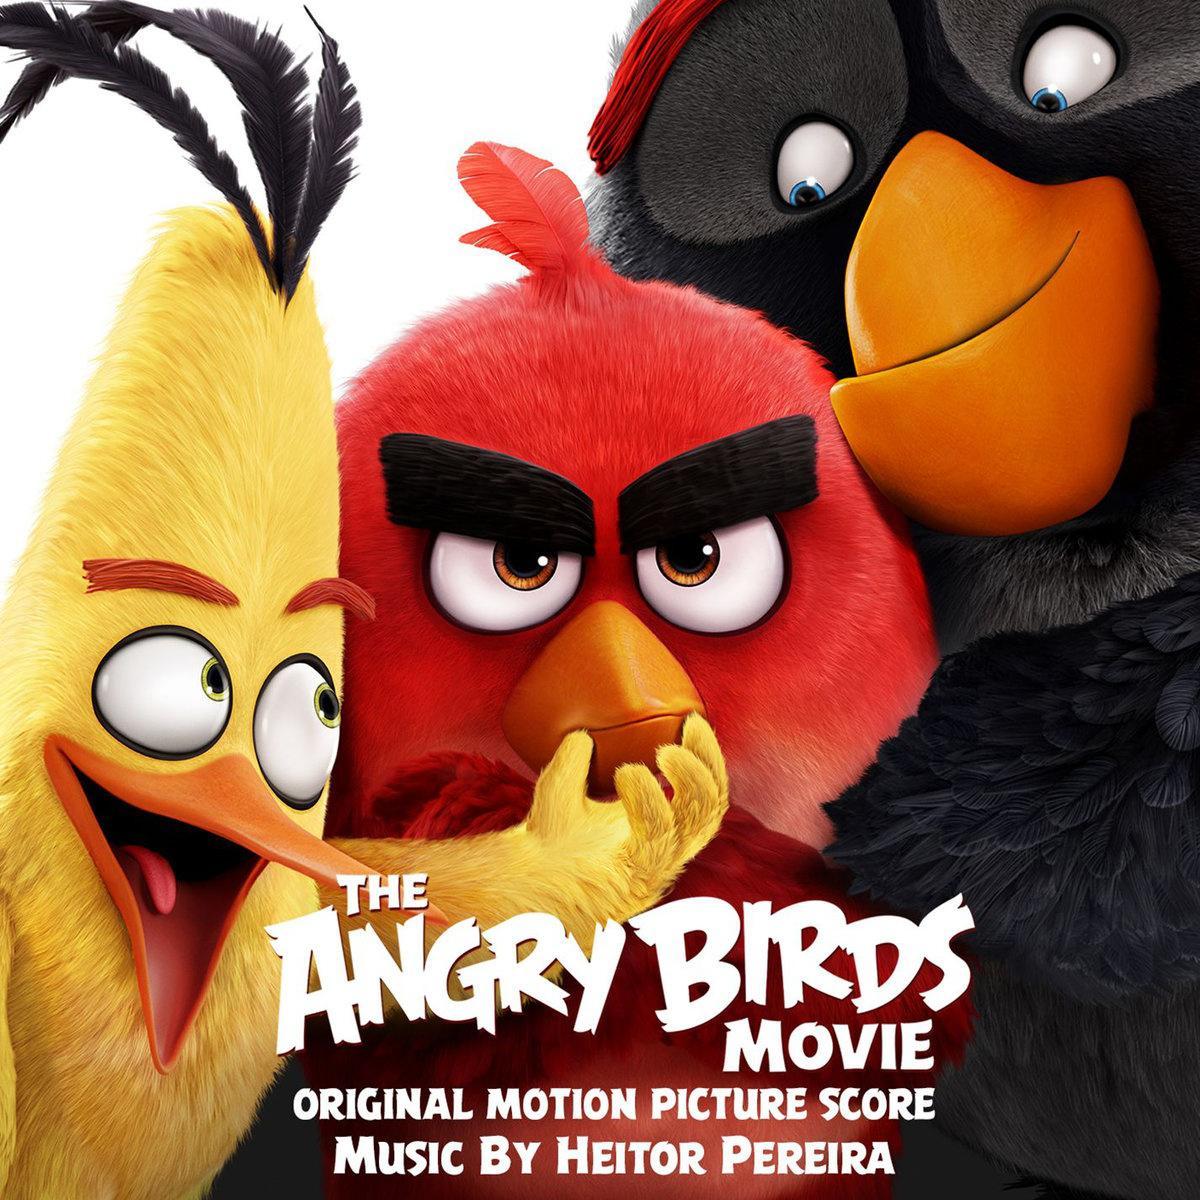 怒的小鸟_The Angry Birds Movie (Original Motion Picture Score)(《愤怒的小鸟大电影 ...